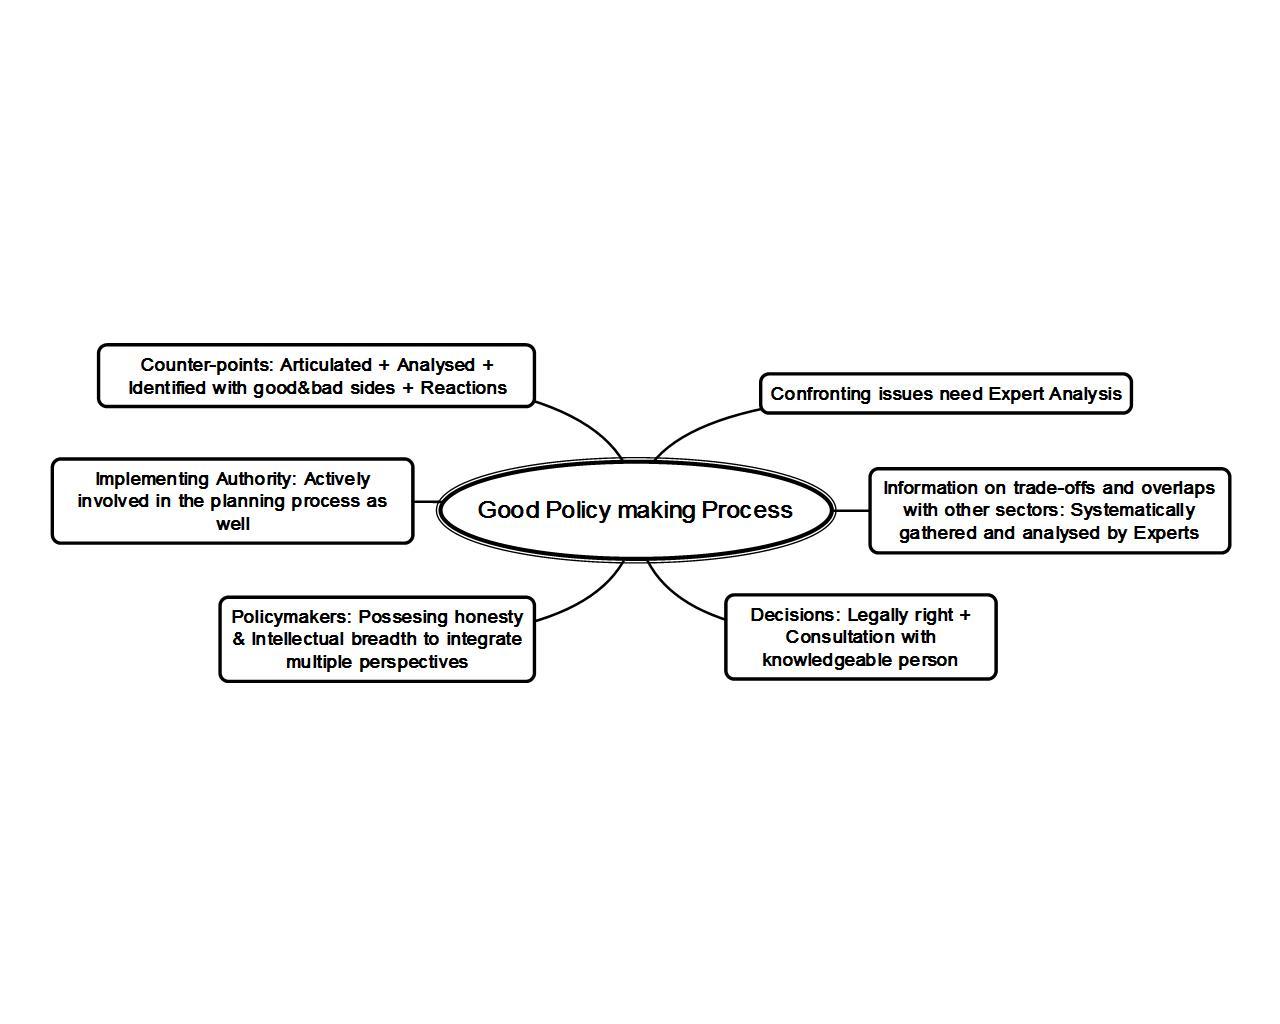 Good Policy making Process